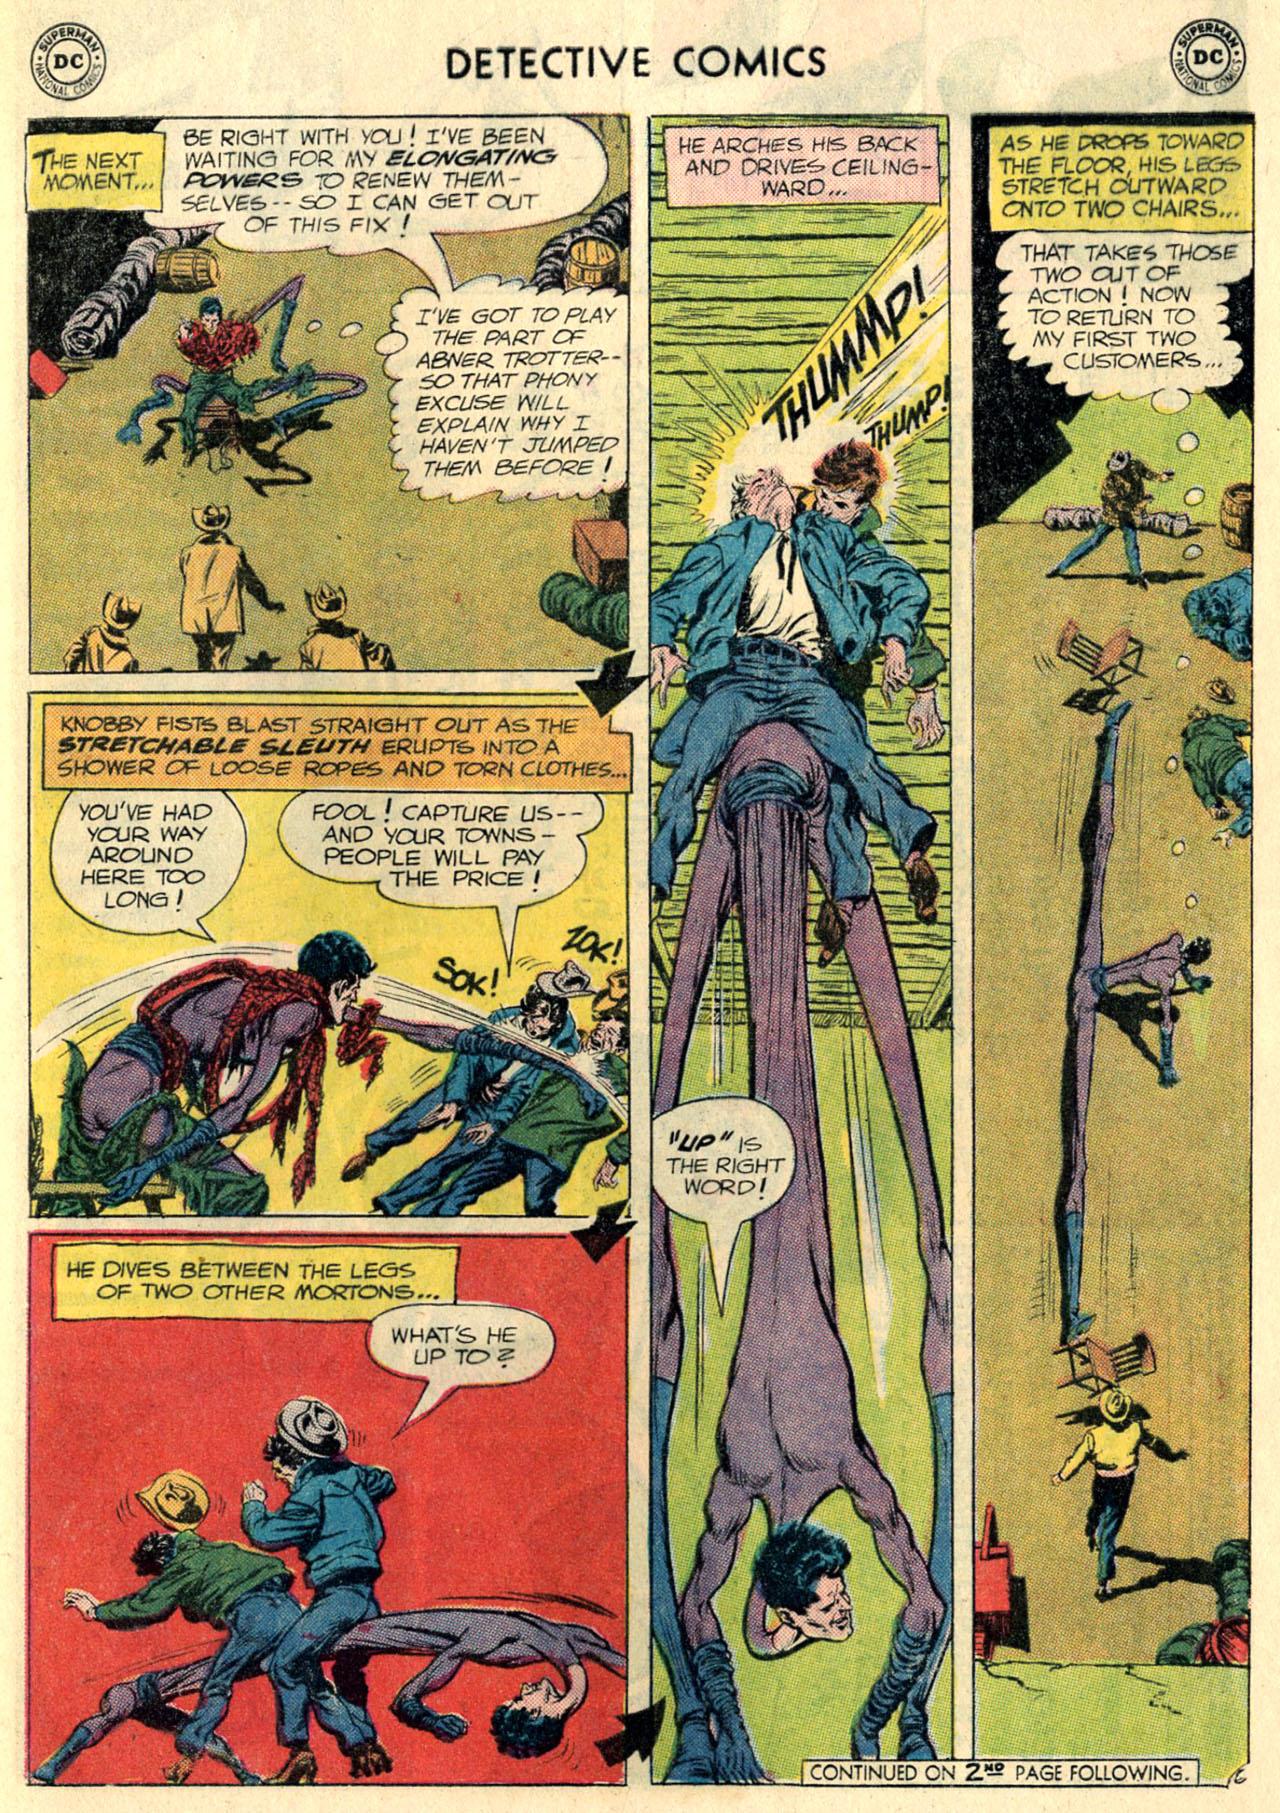 Detective Comics (1937) 341 Page 28